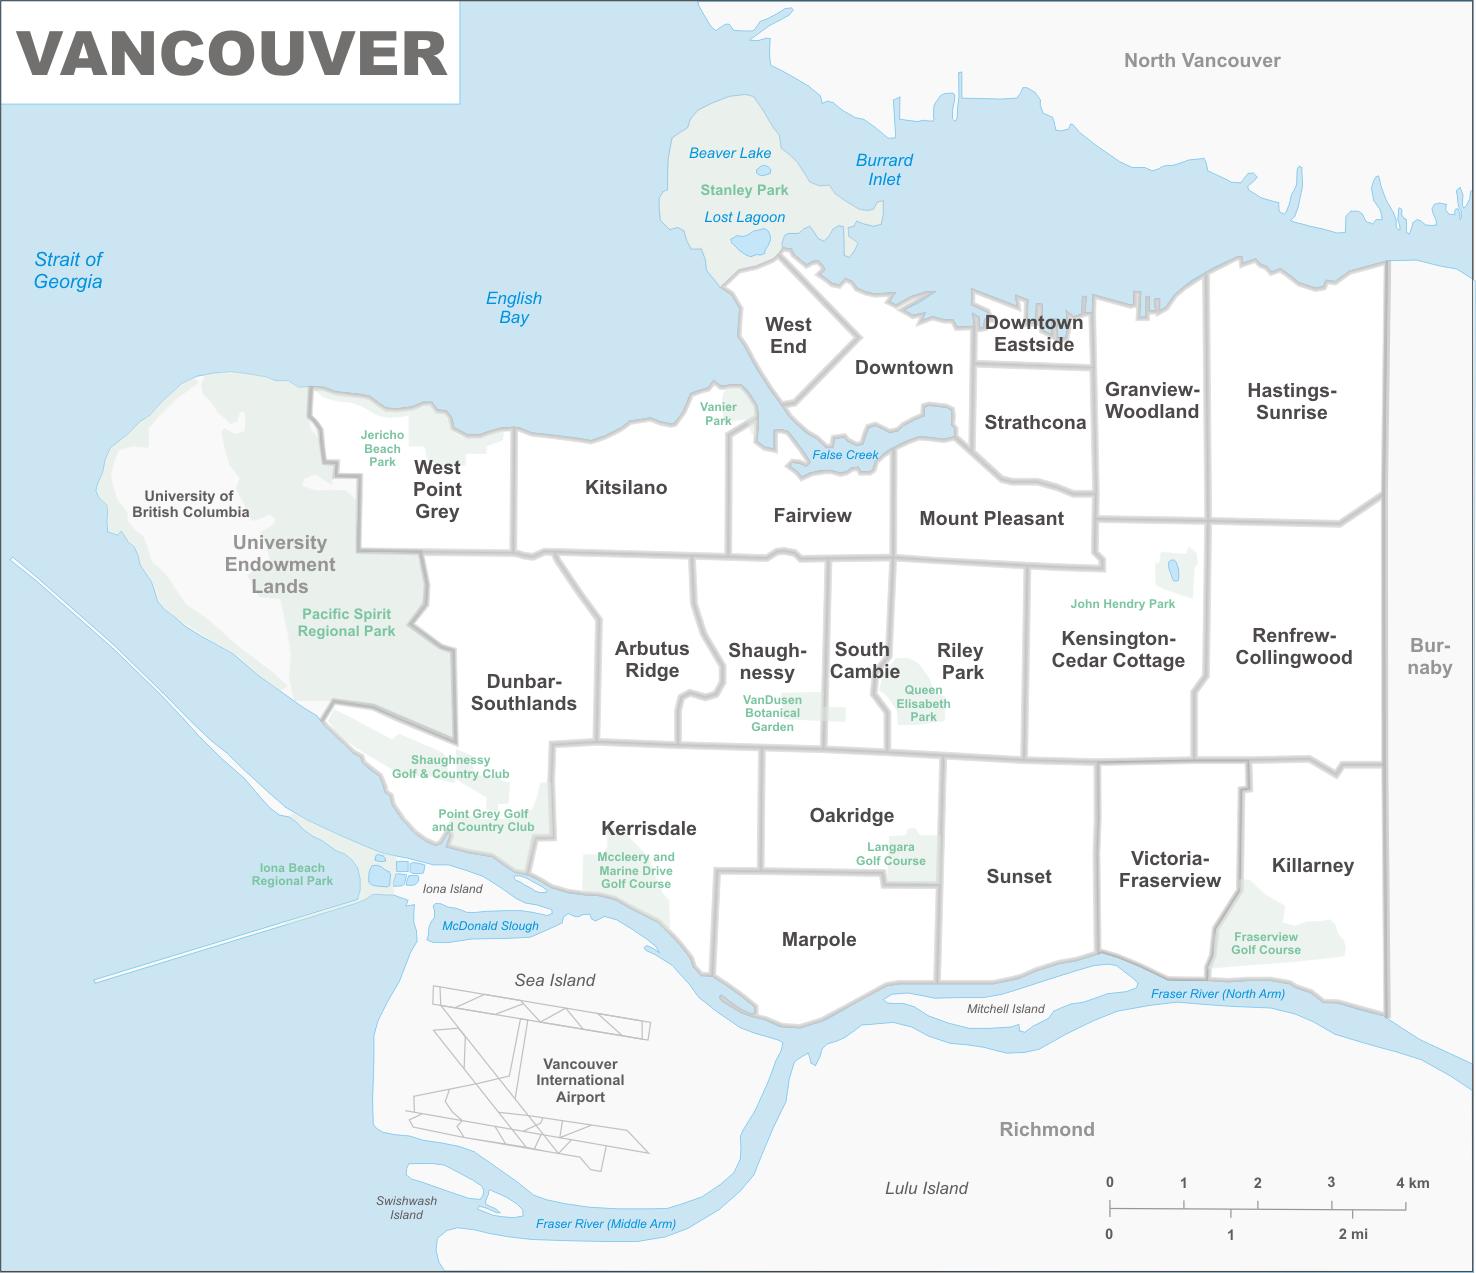 Vancouver Neighbourhood Map Vancouver neighbourhood map   Superhero Property Building  Vancouver Neighbourhood Map